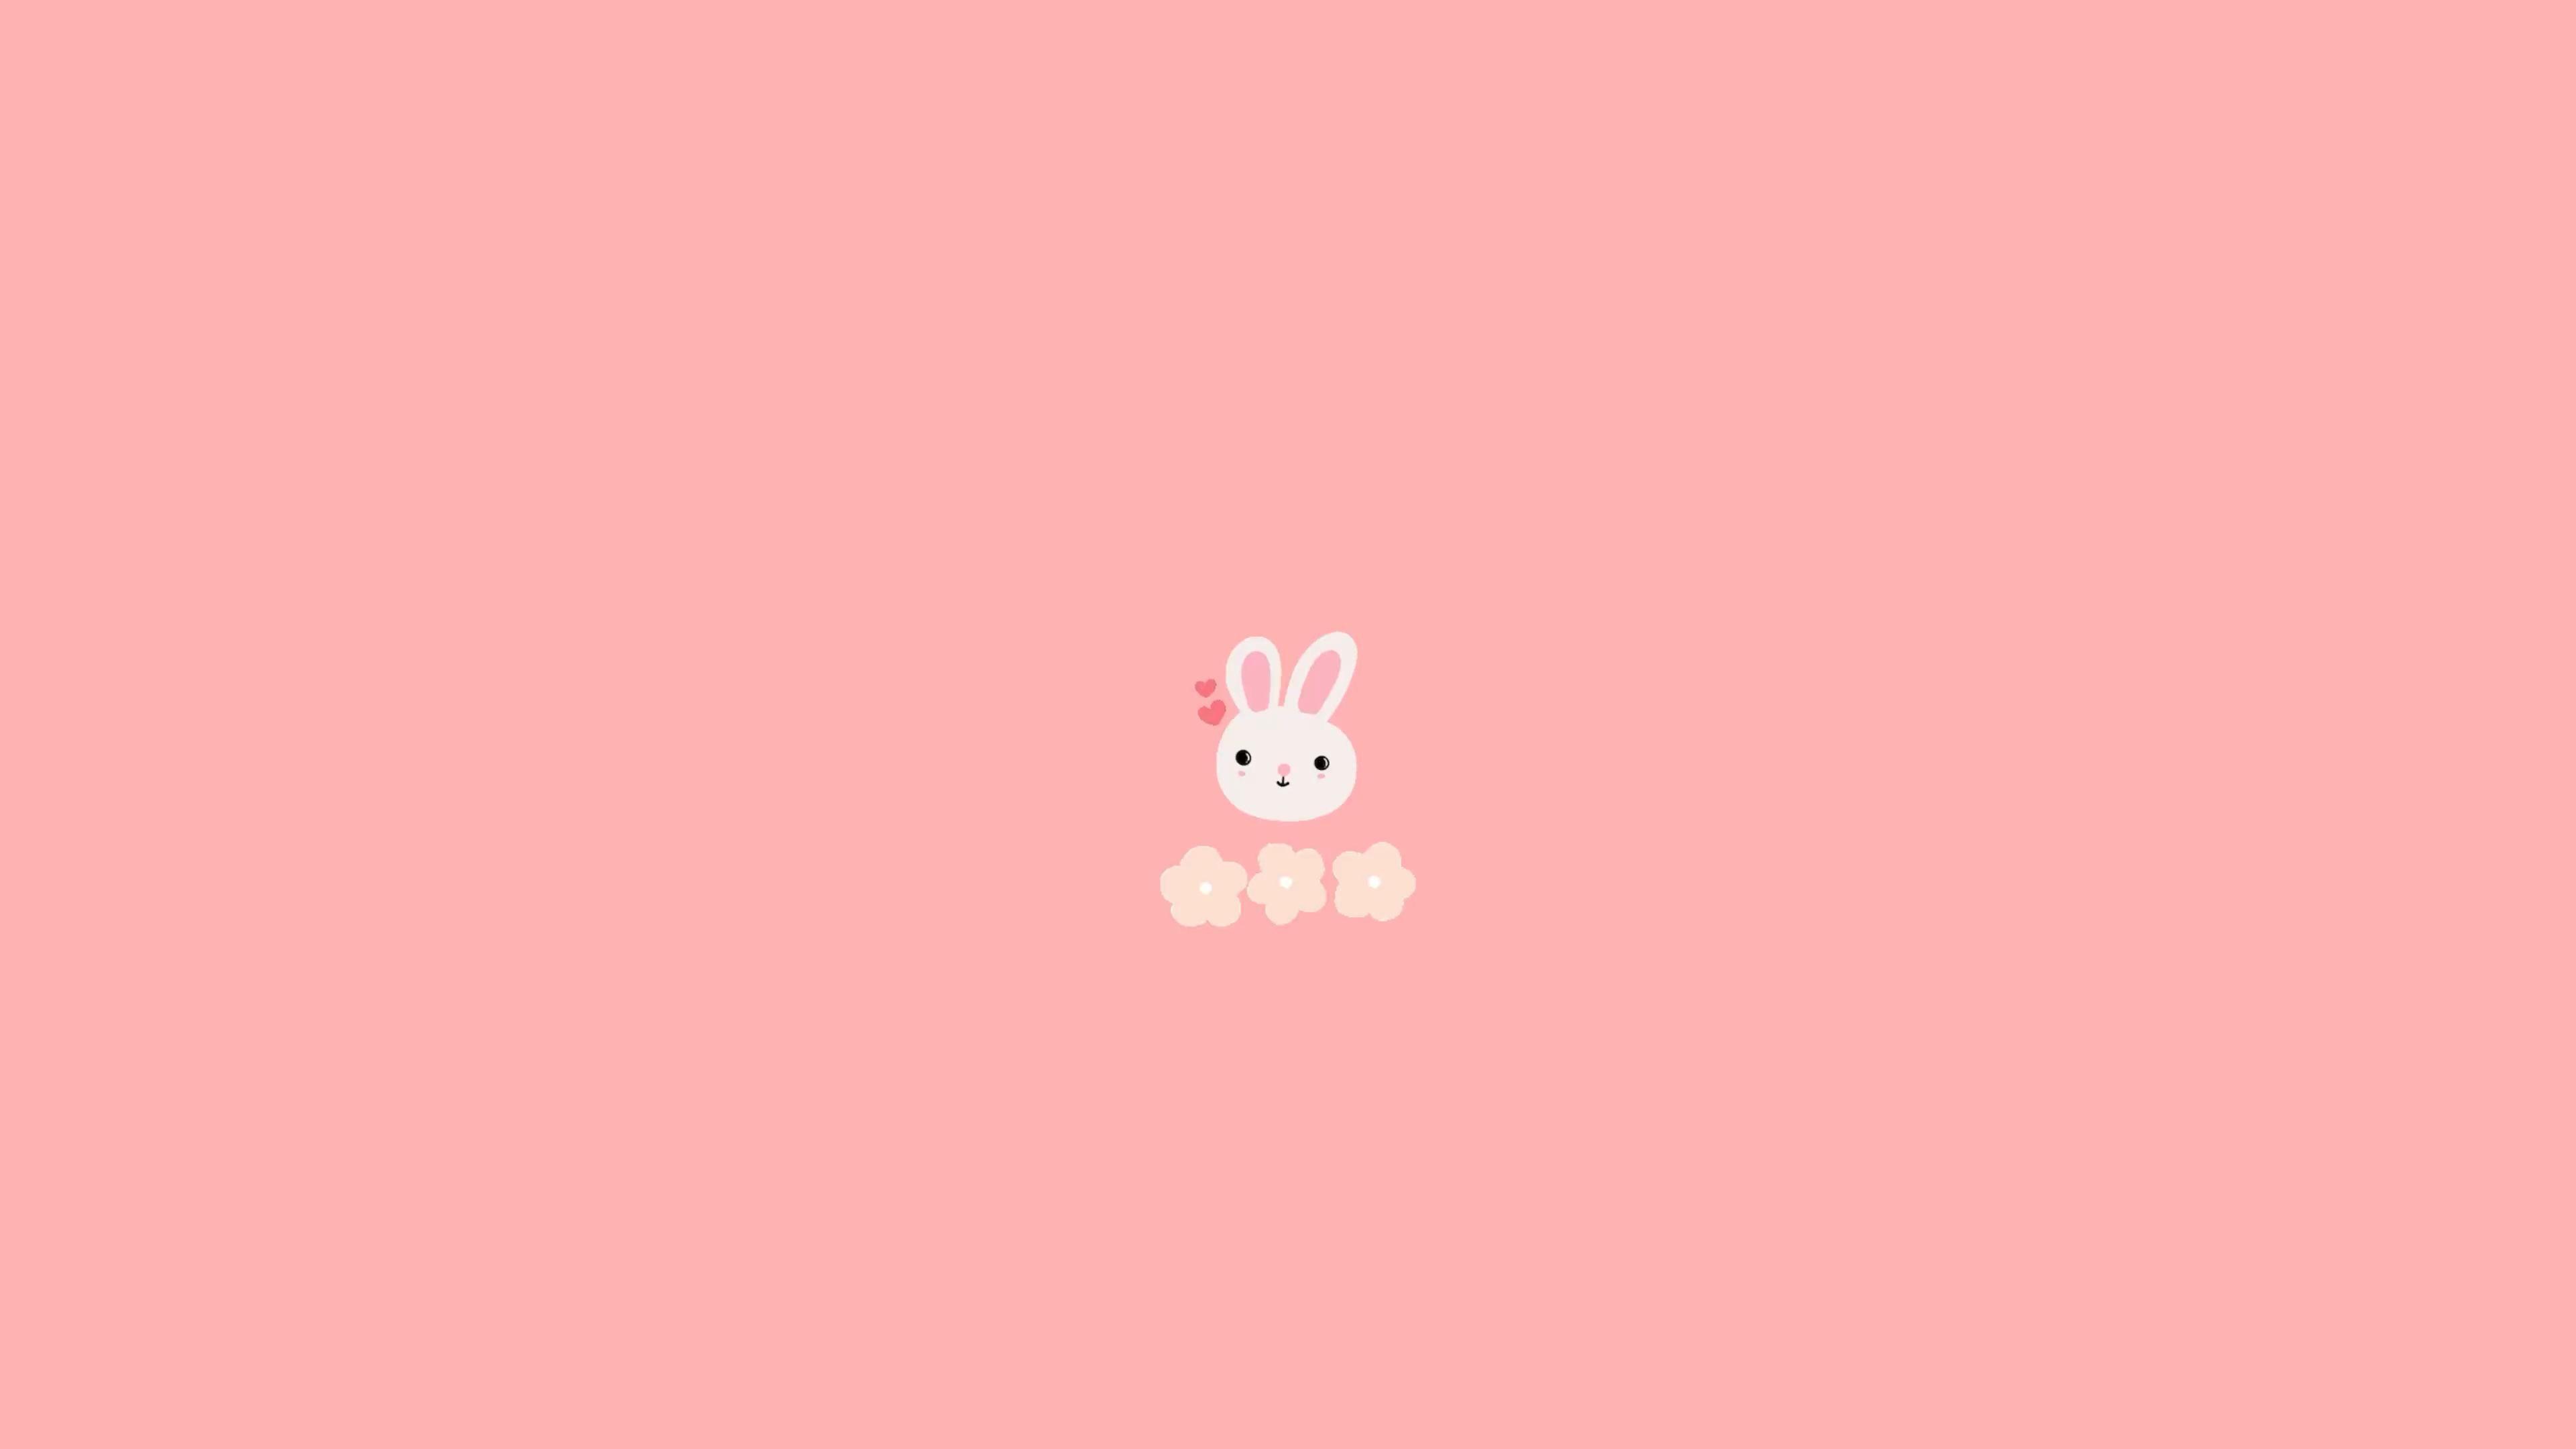 #10 cute Loading Screen